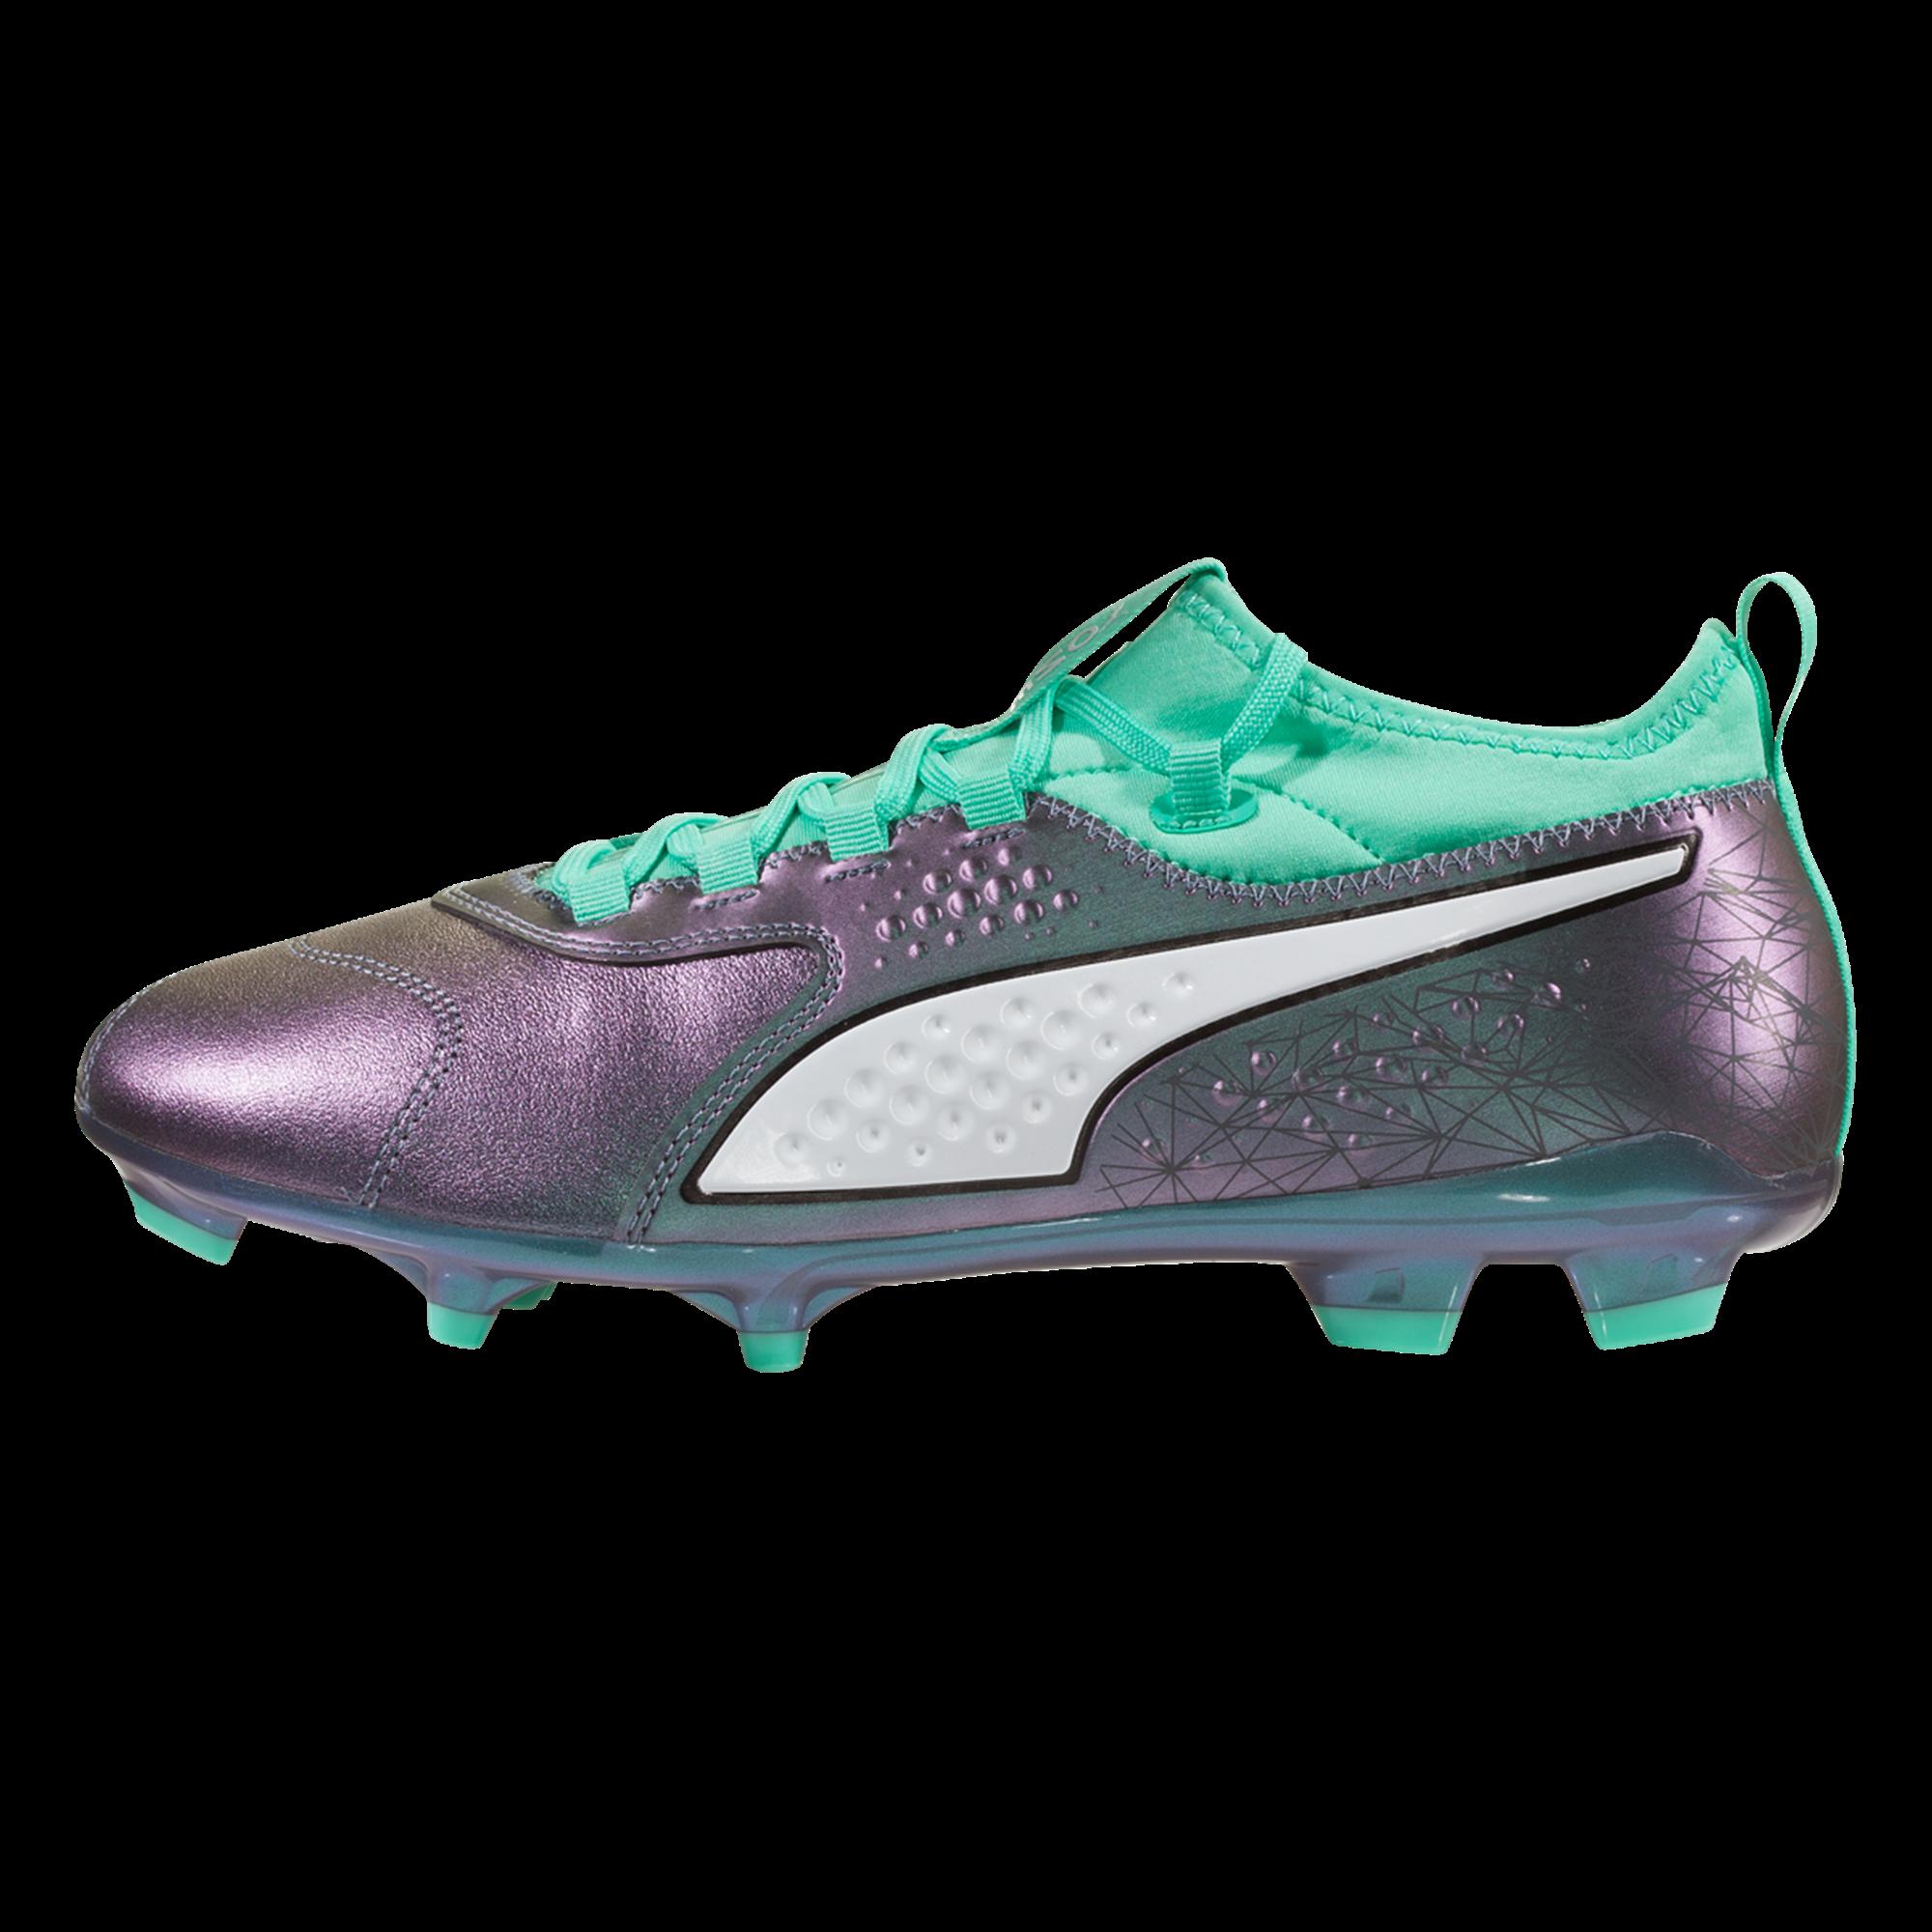 50050e7c1 PUMA ONE 3 WC Leather FG Soccer Cleat - Color Shift/Biscay Green/Puma  White/Puma Black